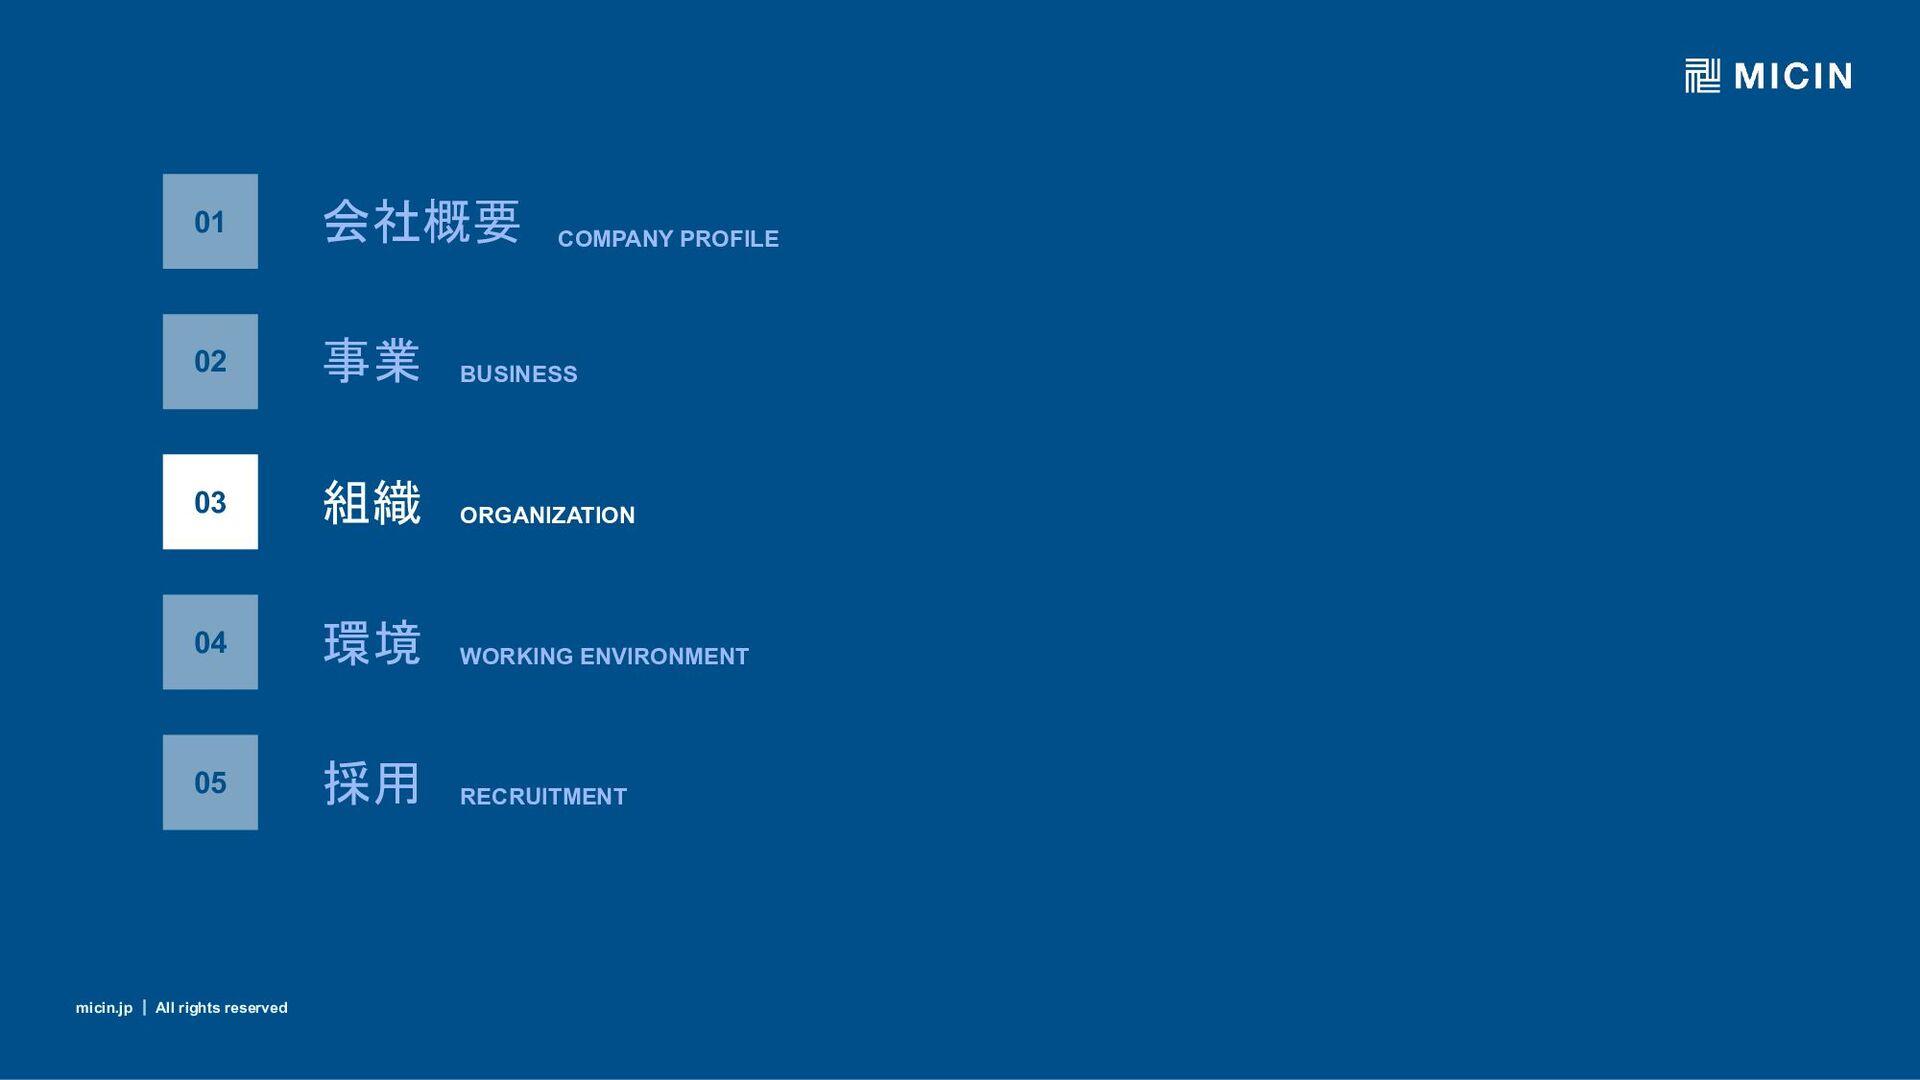 micin.jp ʛ All rights reserved 42 メンバー紹介 03 O R...